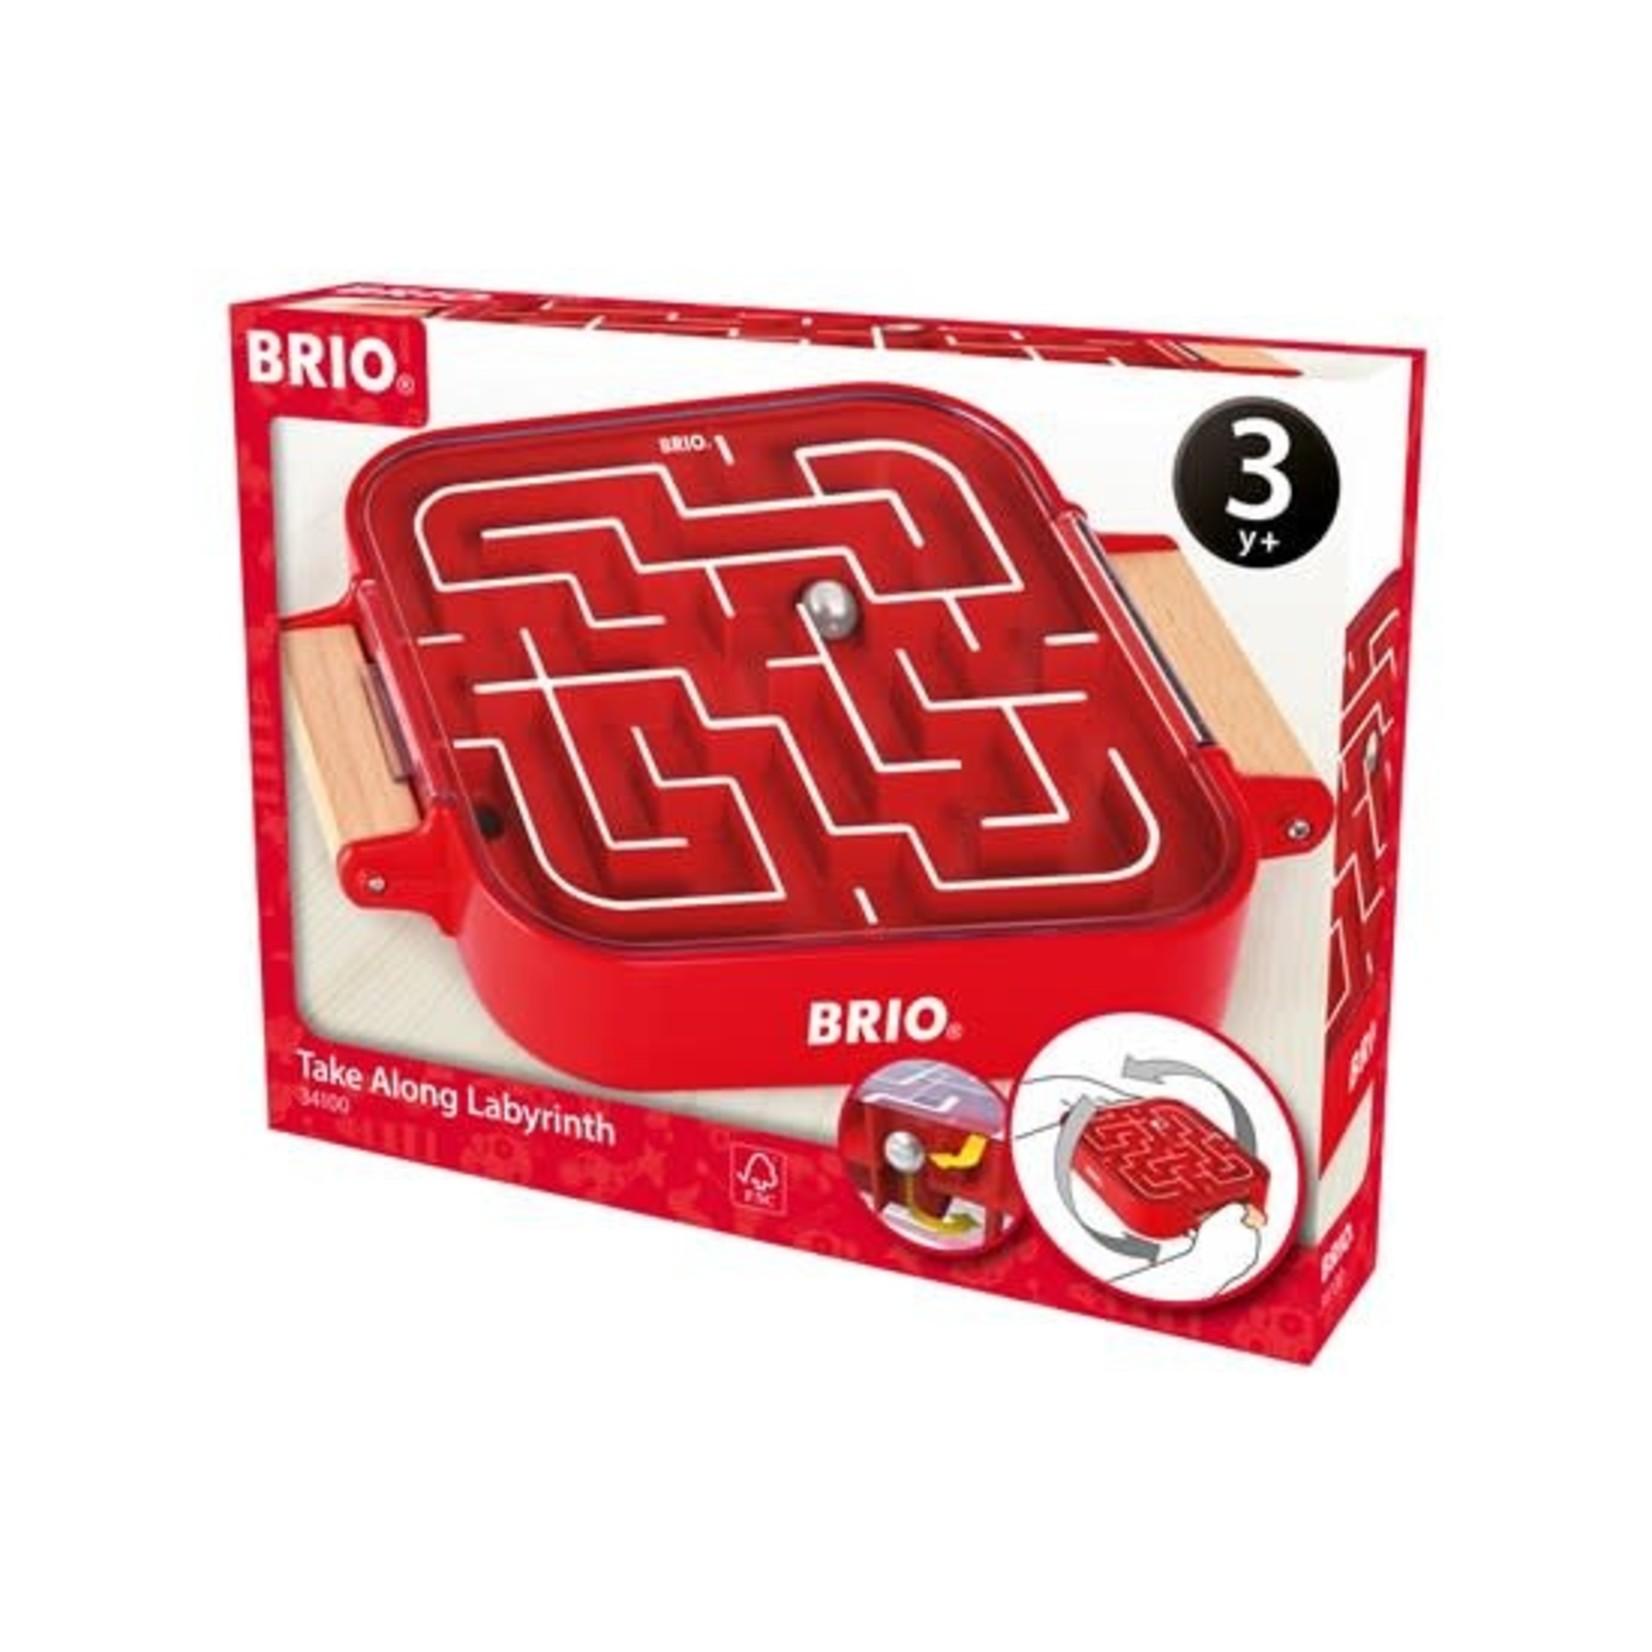 BRIO 34100 TAKE-ALONG LABRYRINTH GAME